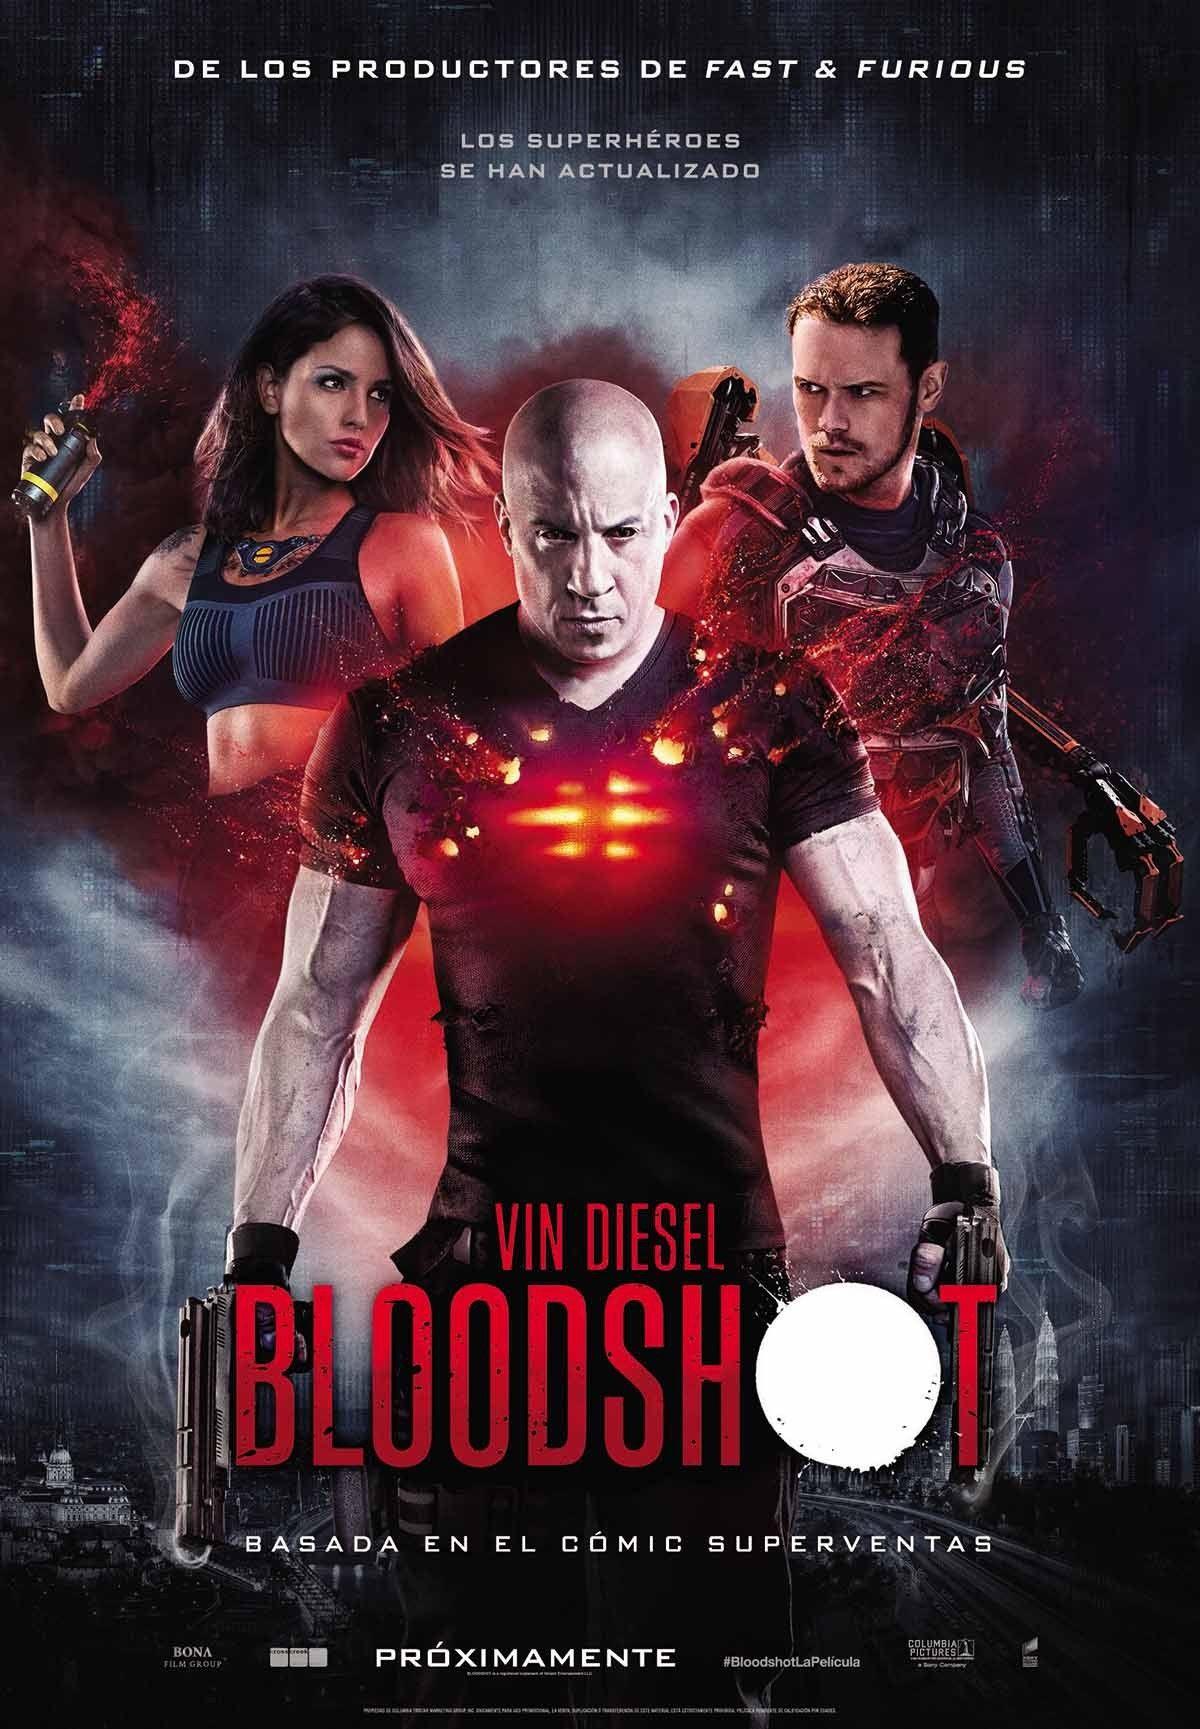 Bloodshot Bloodshot Películas Completas Gratis Películas Completas Ver Peliculas Completas